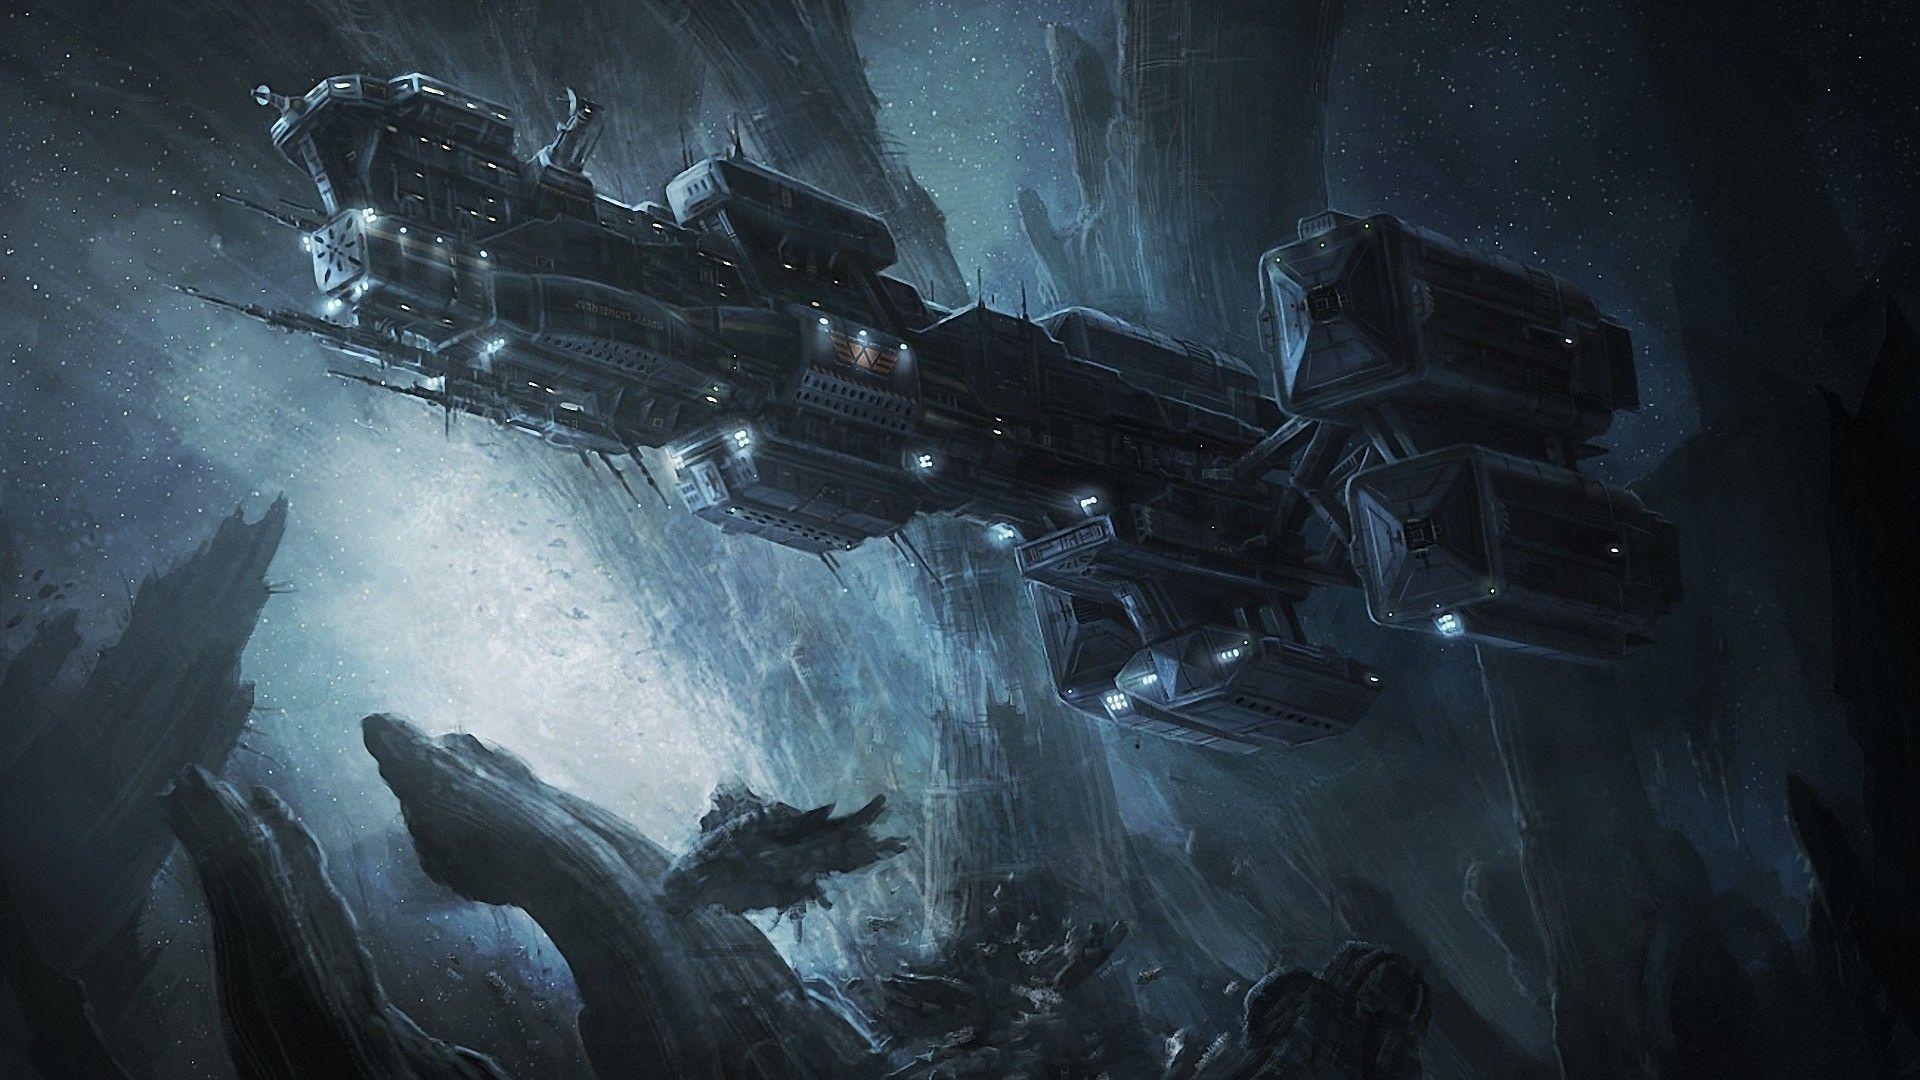 Prometheus spaceship Wallpaper #